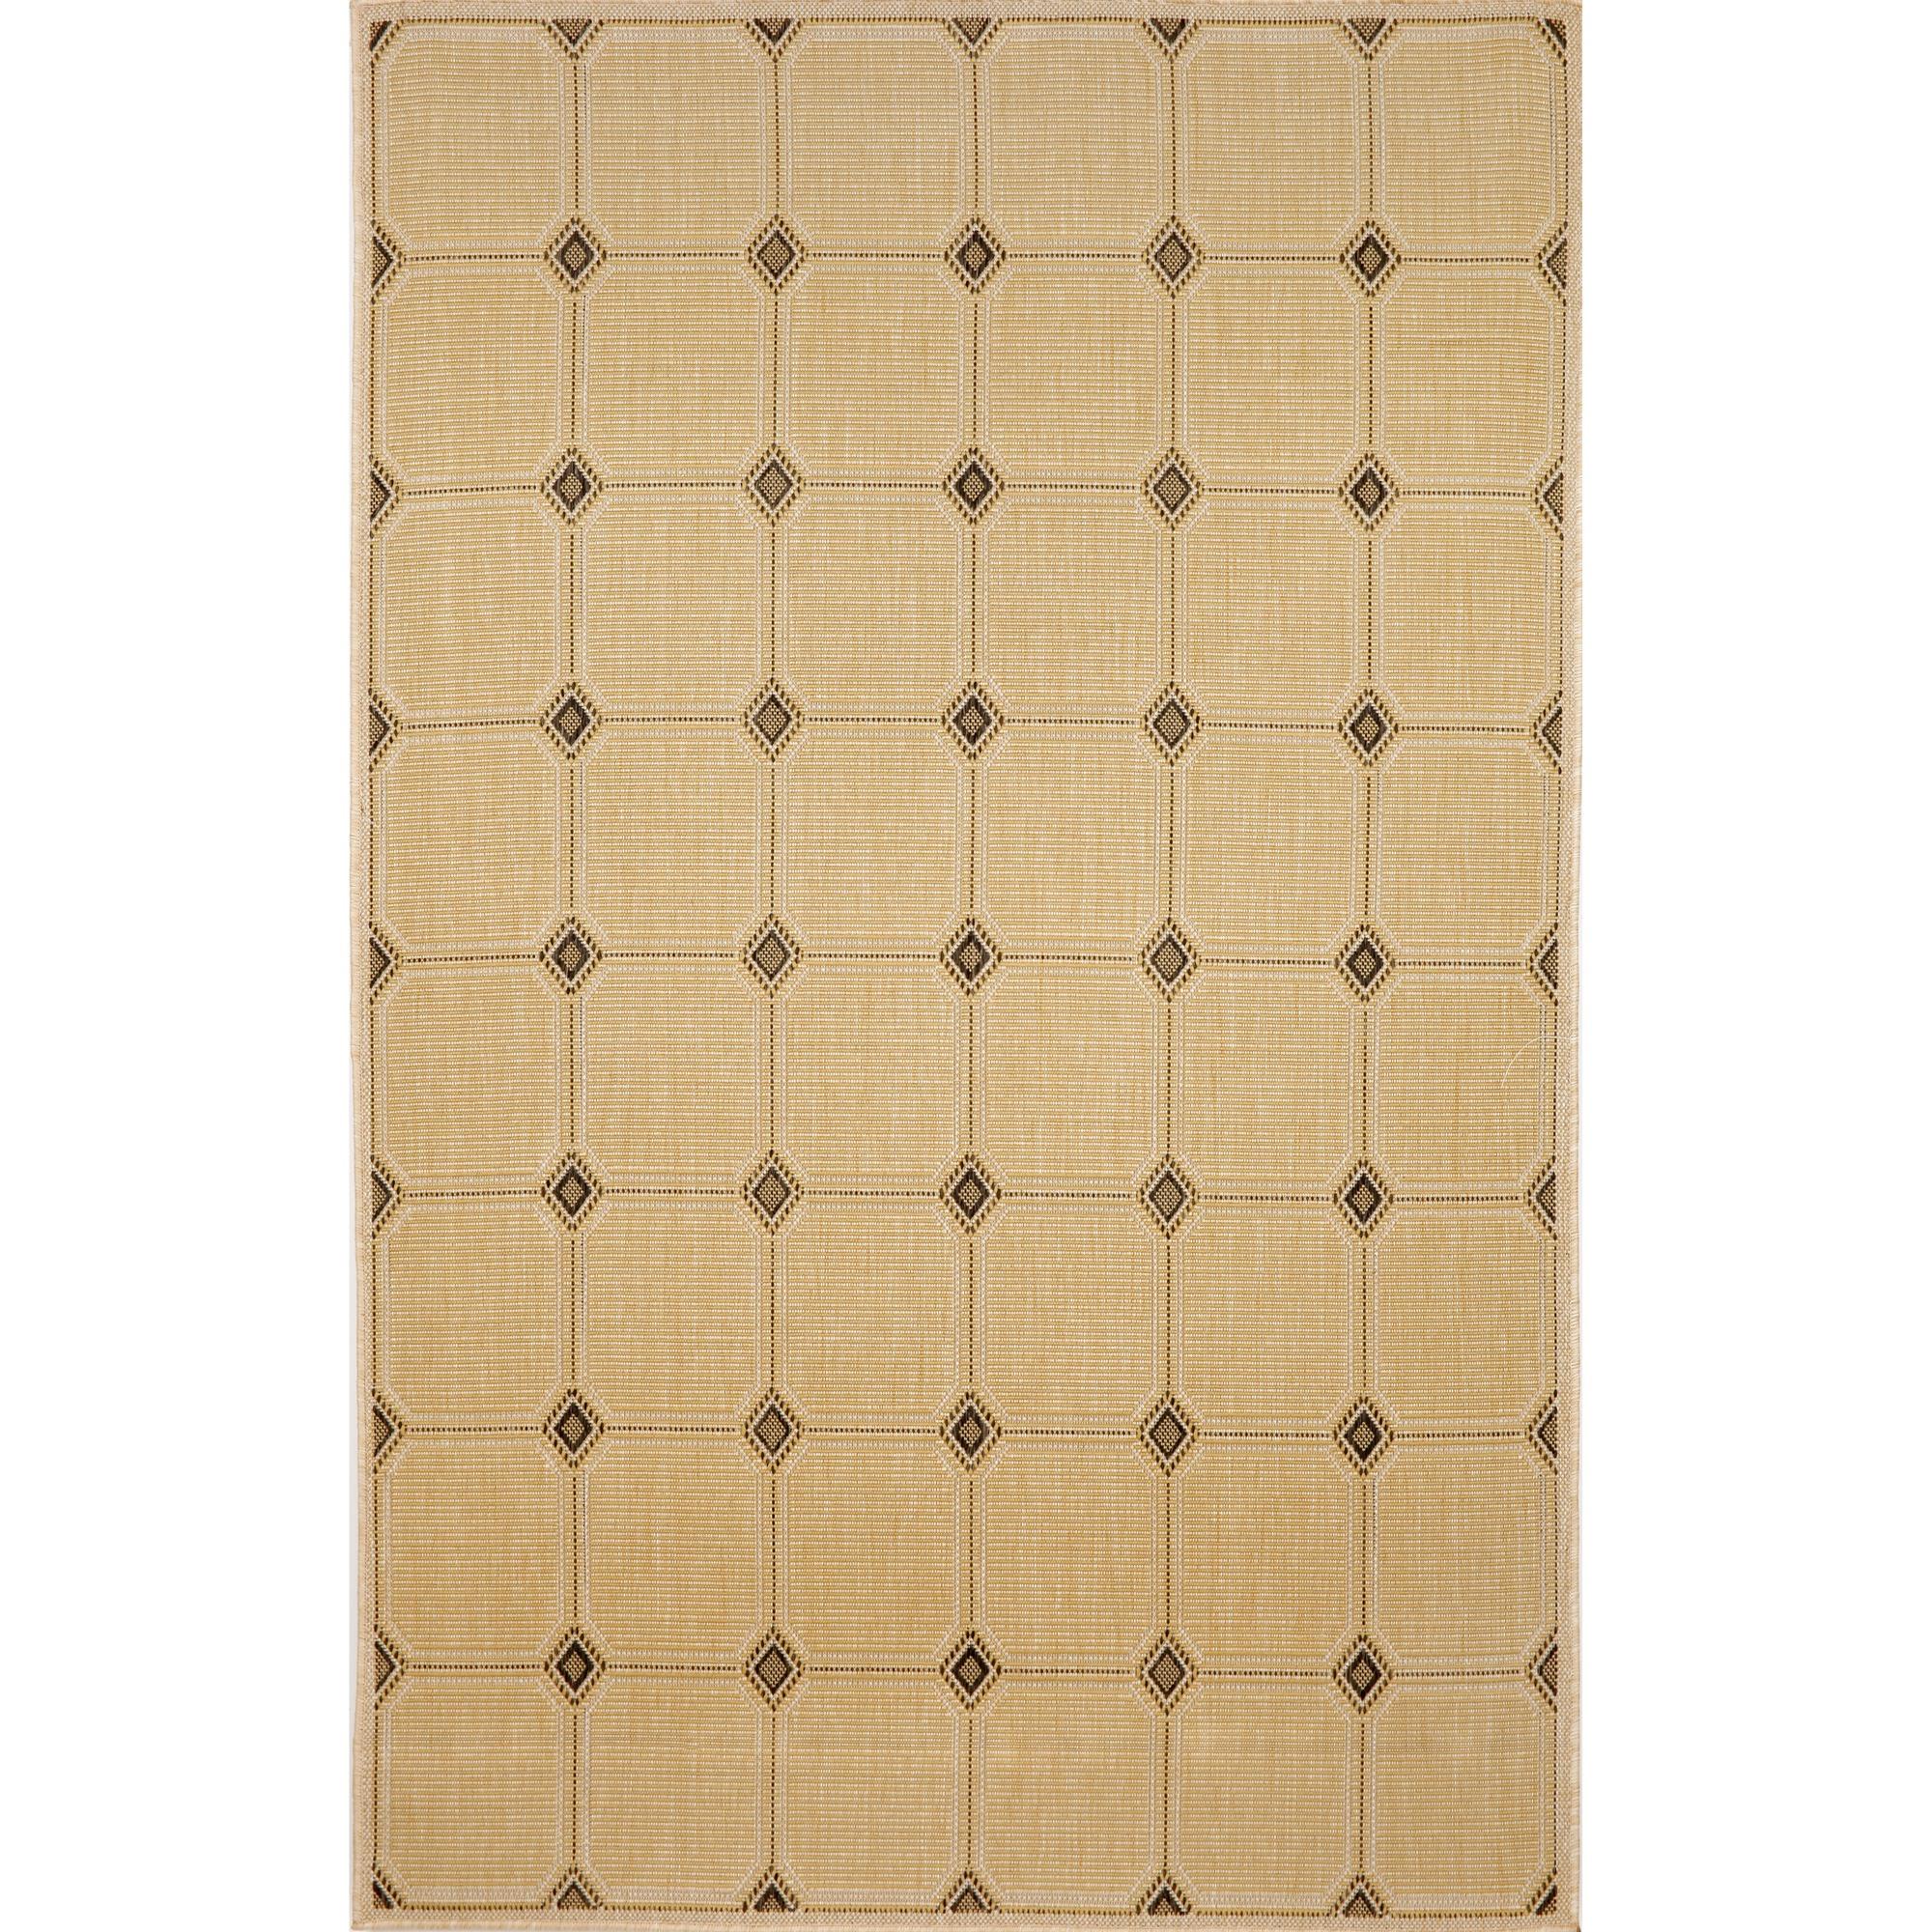 Shop terrace texture yellow outdoor rug 7 39 10 x 9 39 10 for Terrace tiles texture